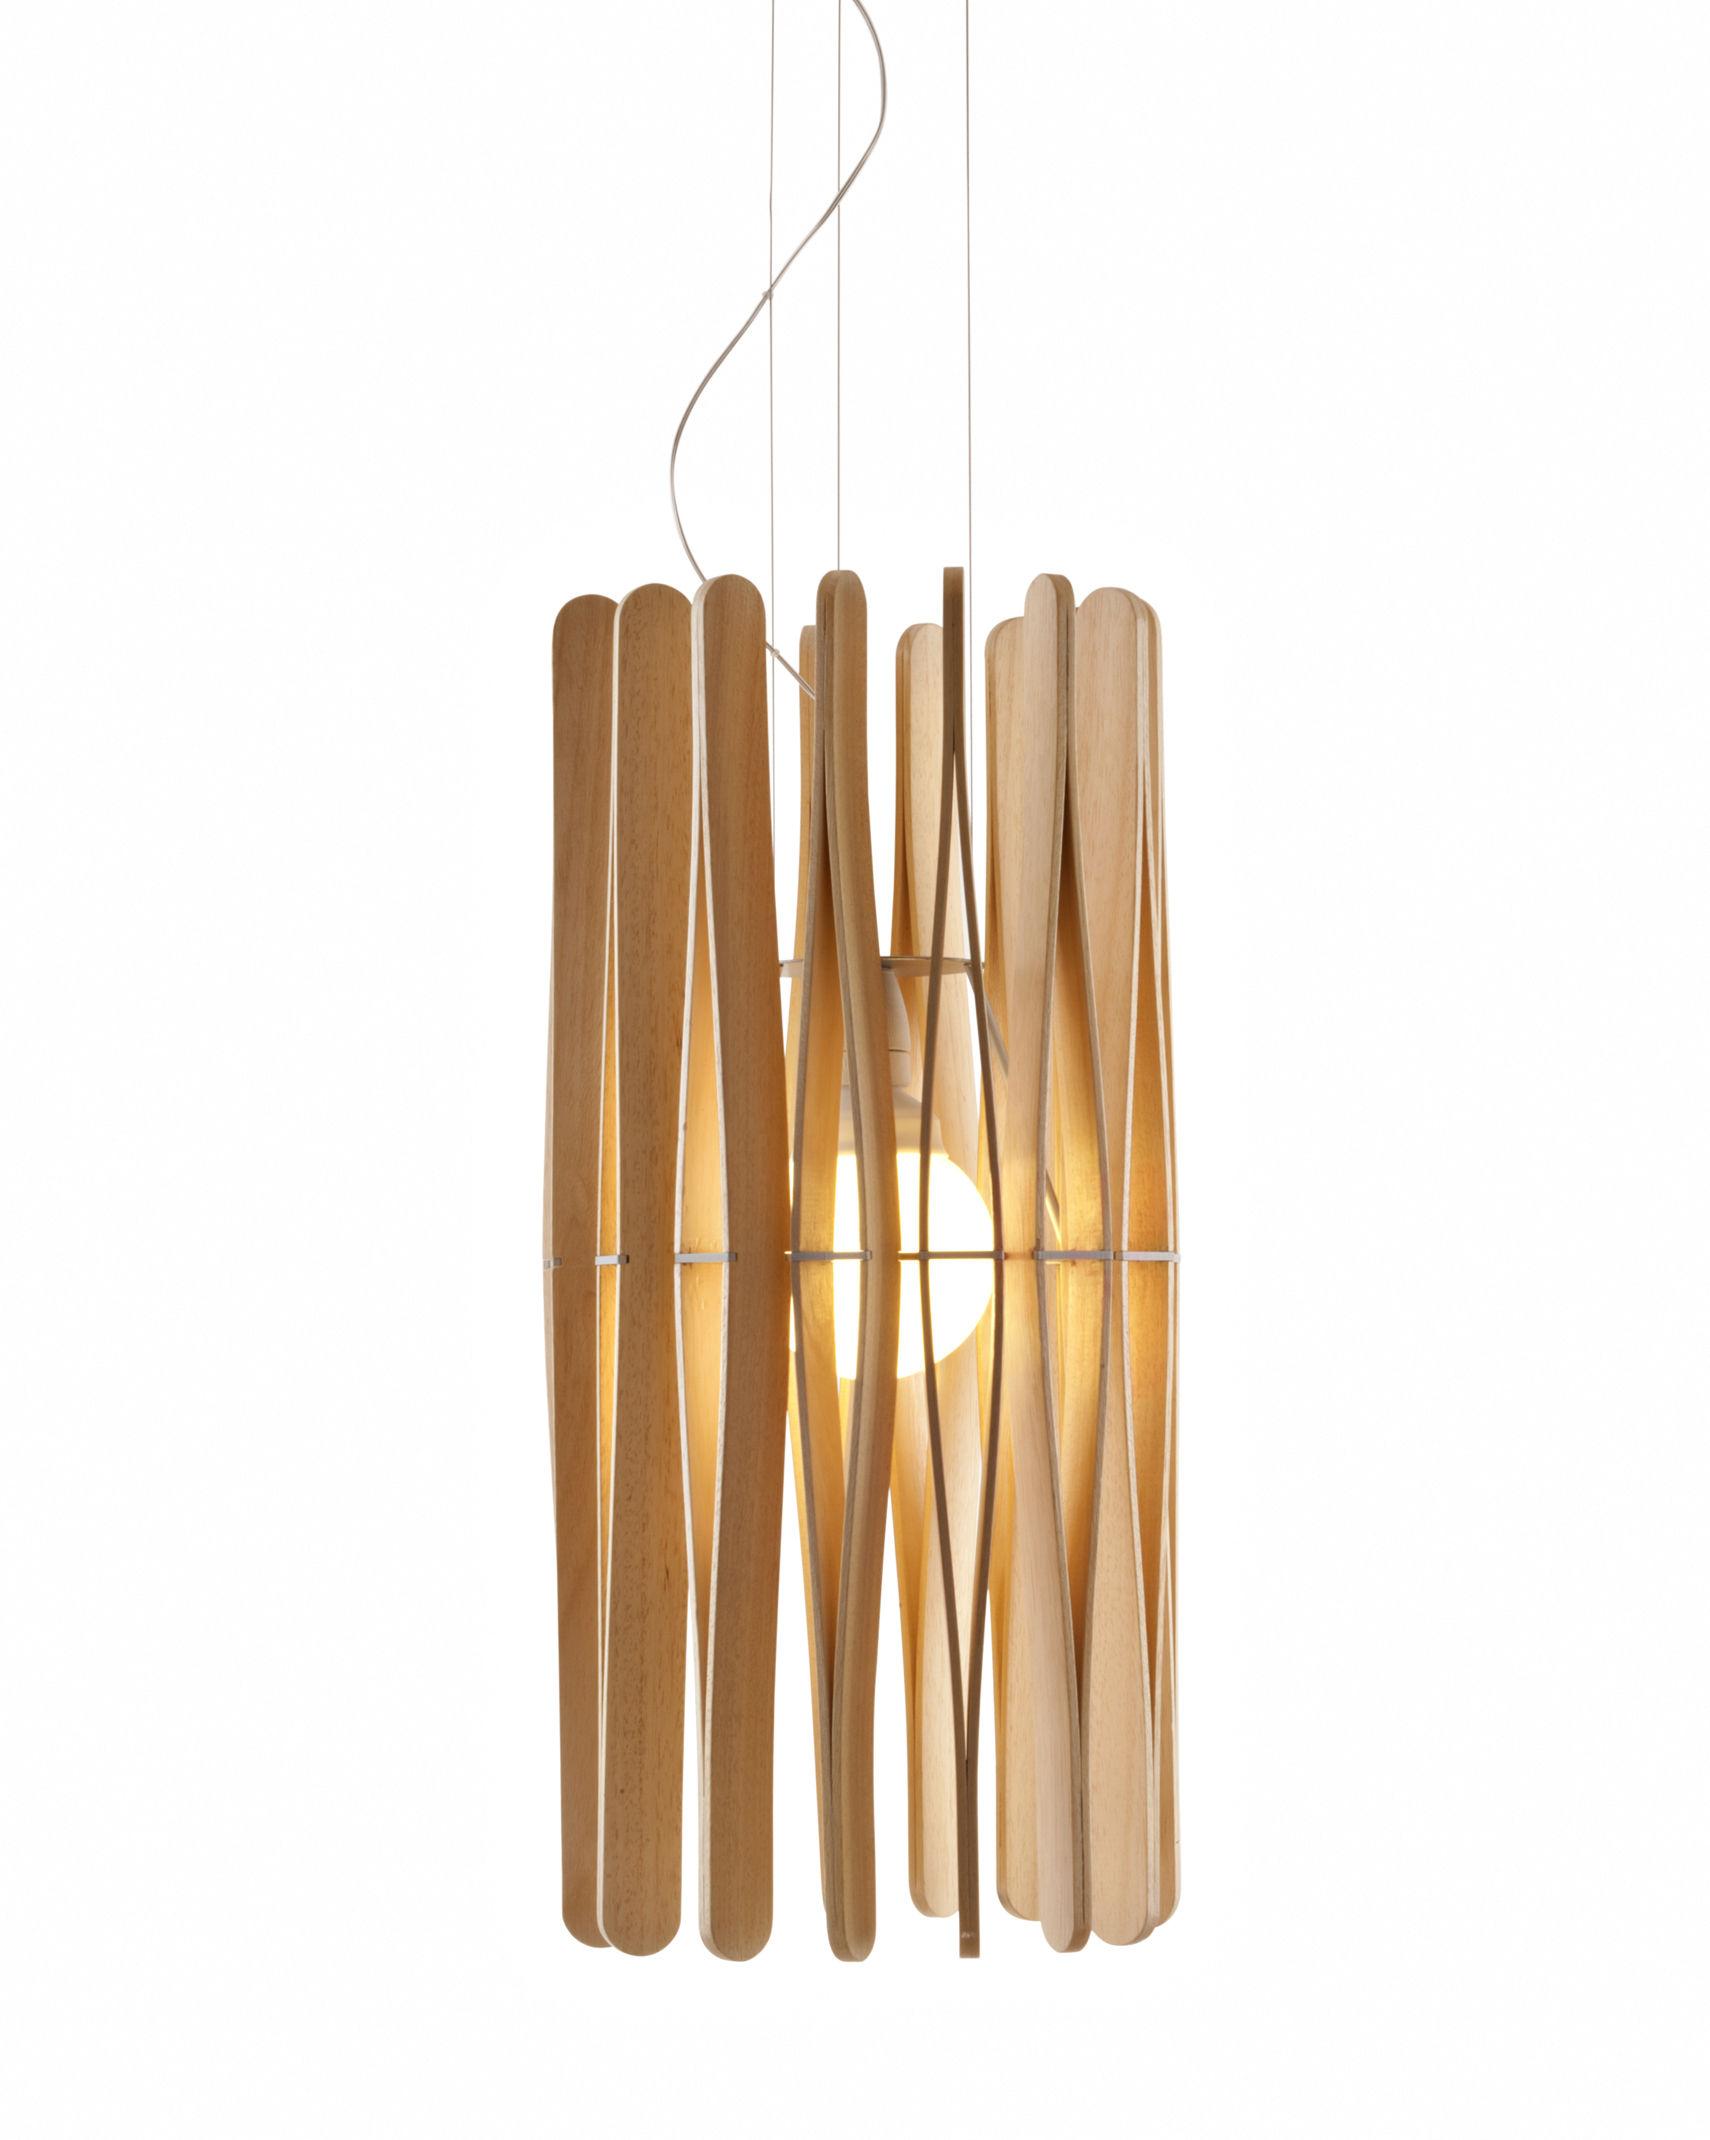 Leuchten - Pendelleuchten - Stick 01 Pendelleuchte / Ø 33 x H 65 cm - Fabbian - Holz, hell - Bois Ayous, lackiertes Metall